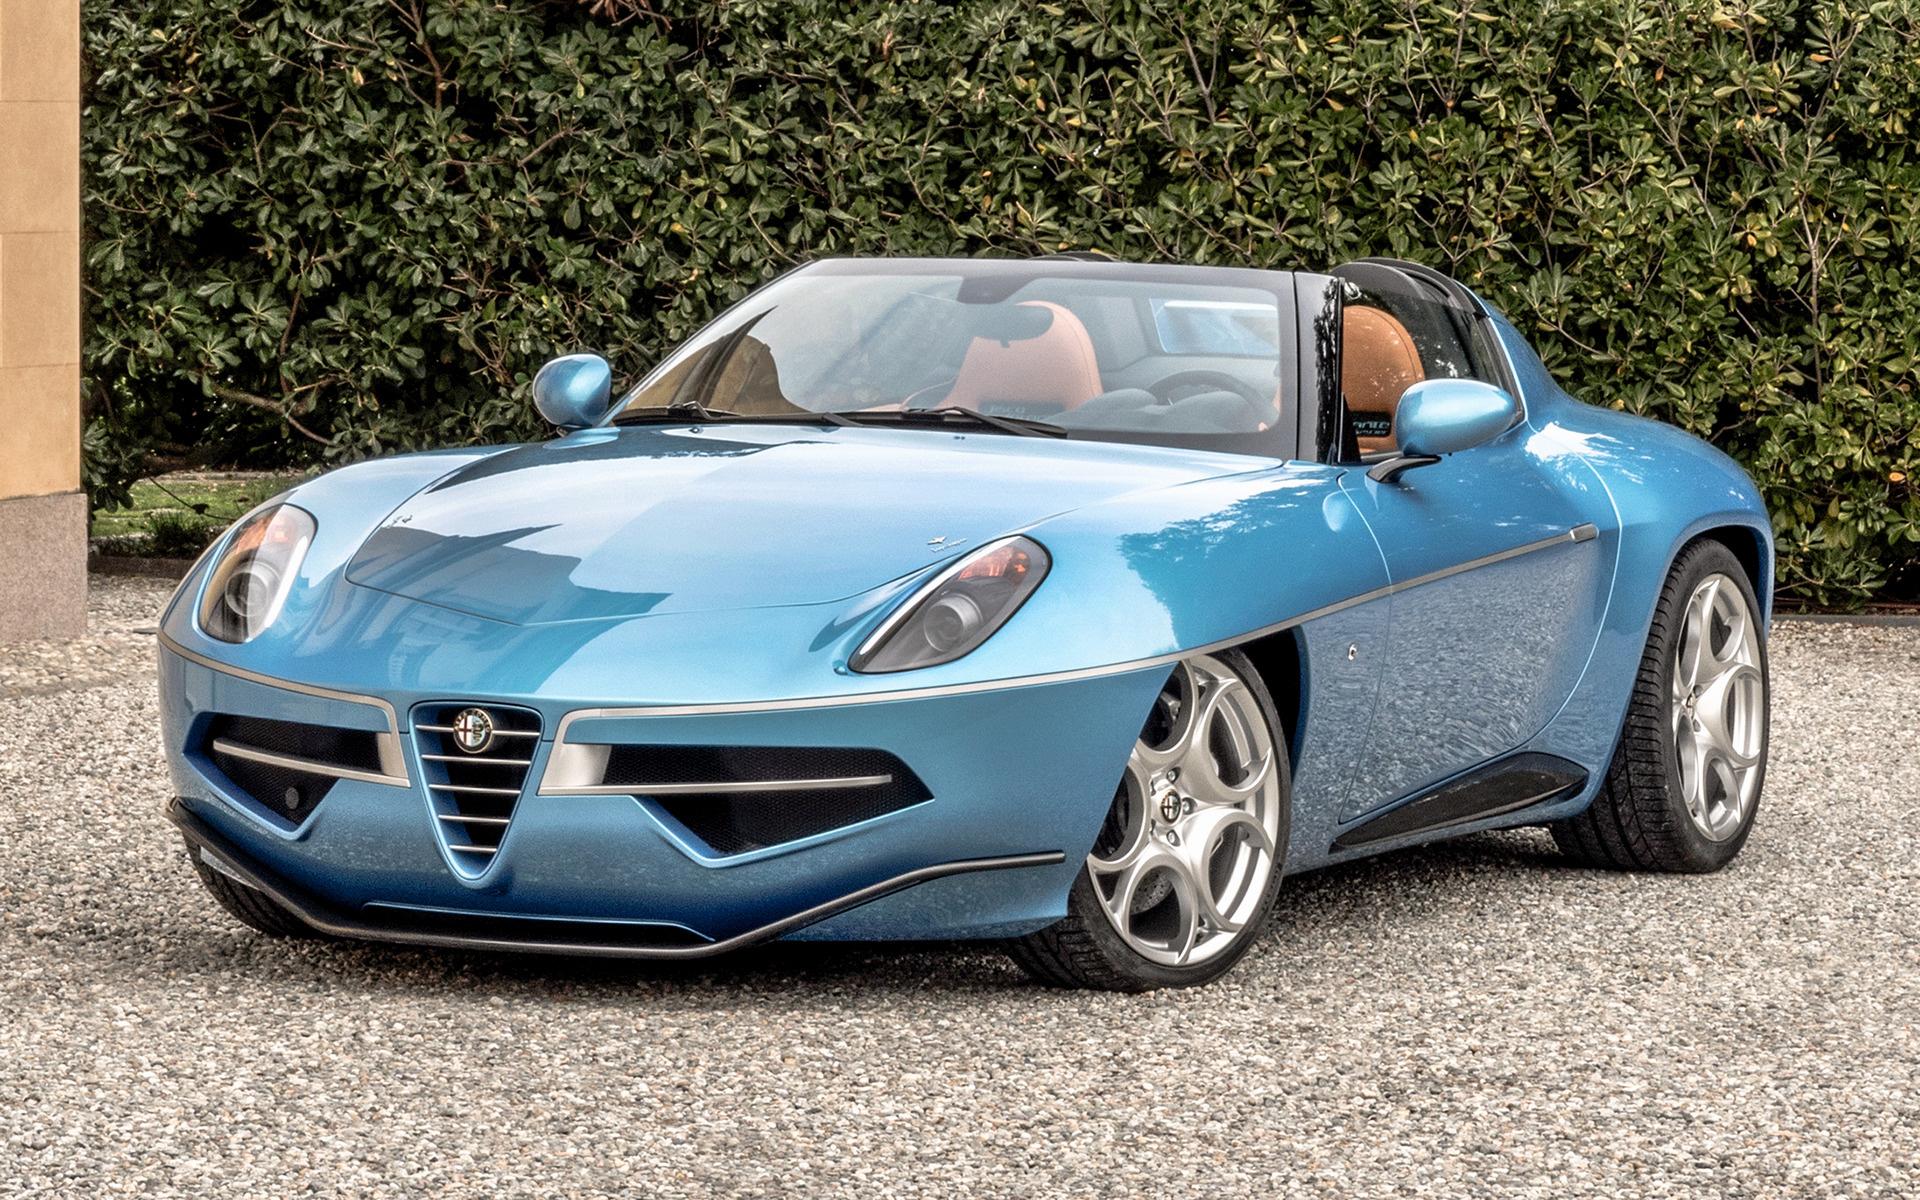 2016 Alfa Romeo Disco Volante Spyder 1 Wallpapers And